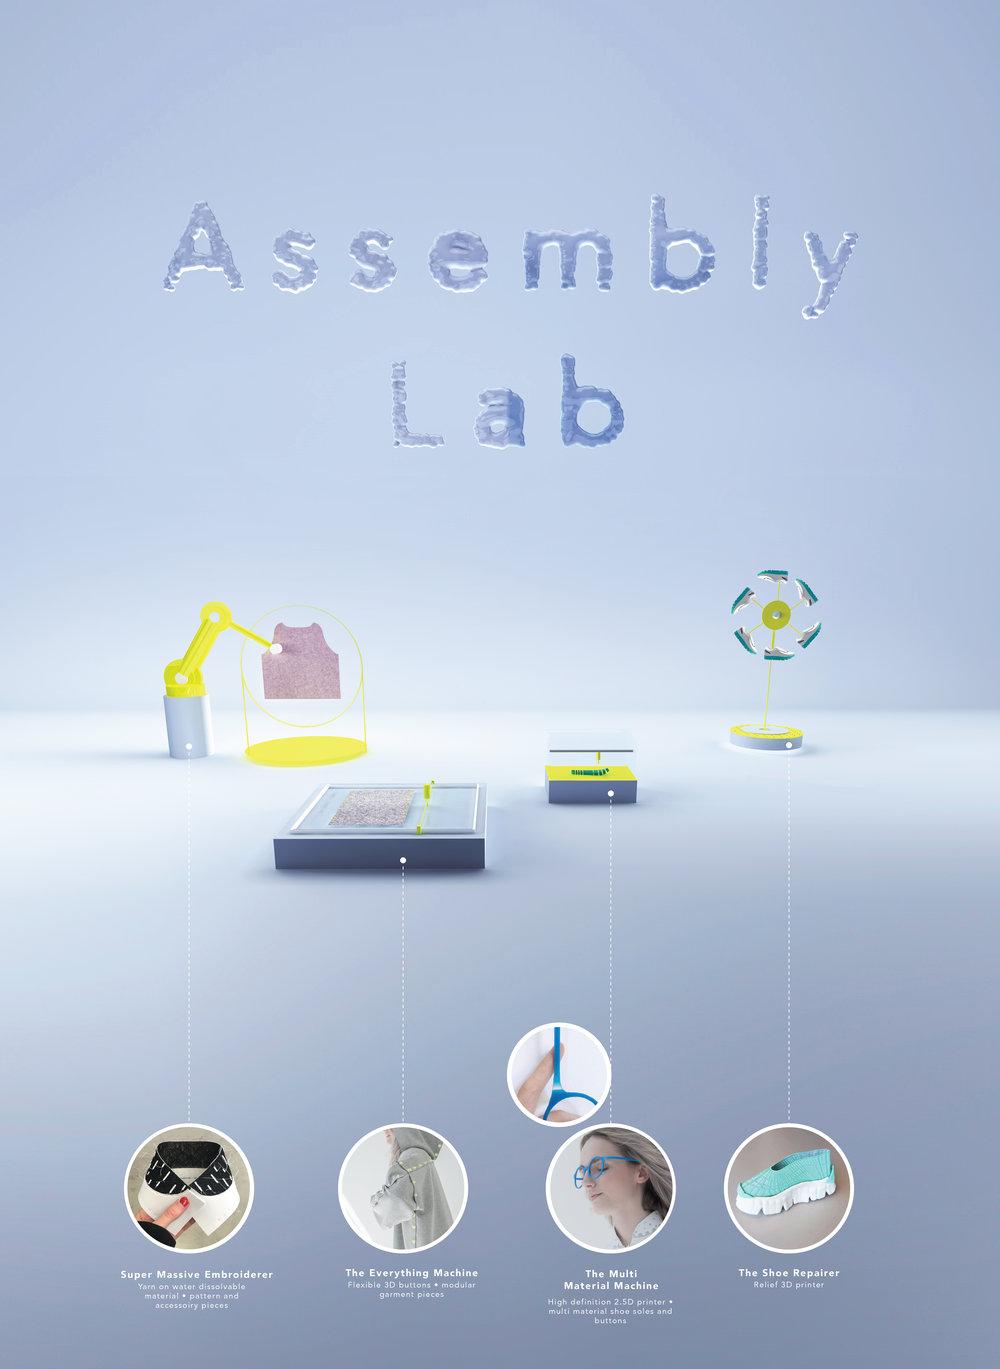 assemblylab_4_2100x2970_300dpi_30contrast_5brightness_gaussianblur75_blue20_LOGO.jpg